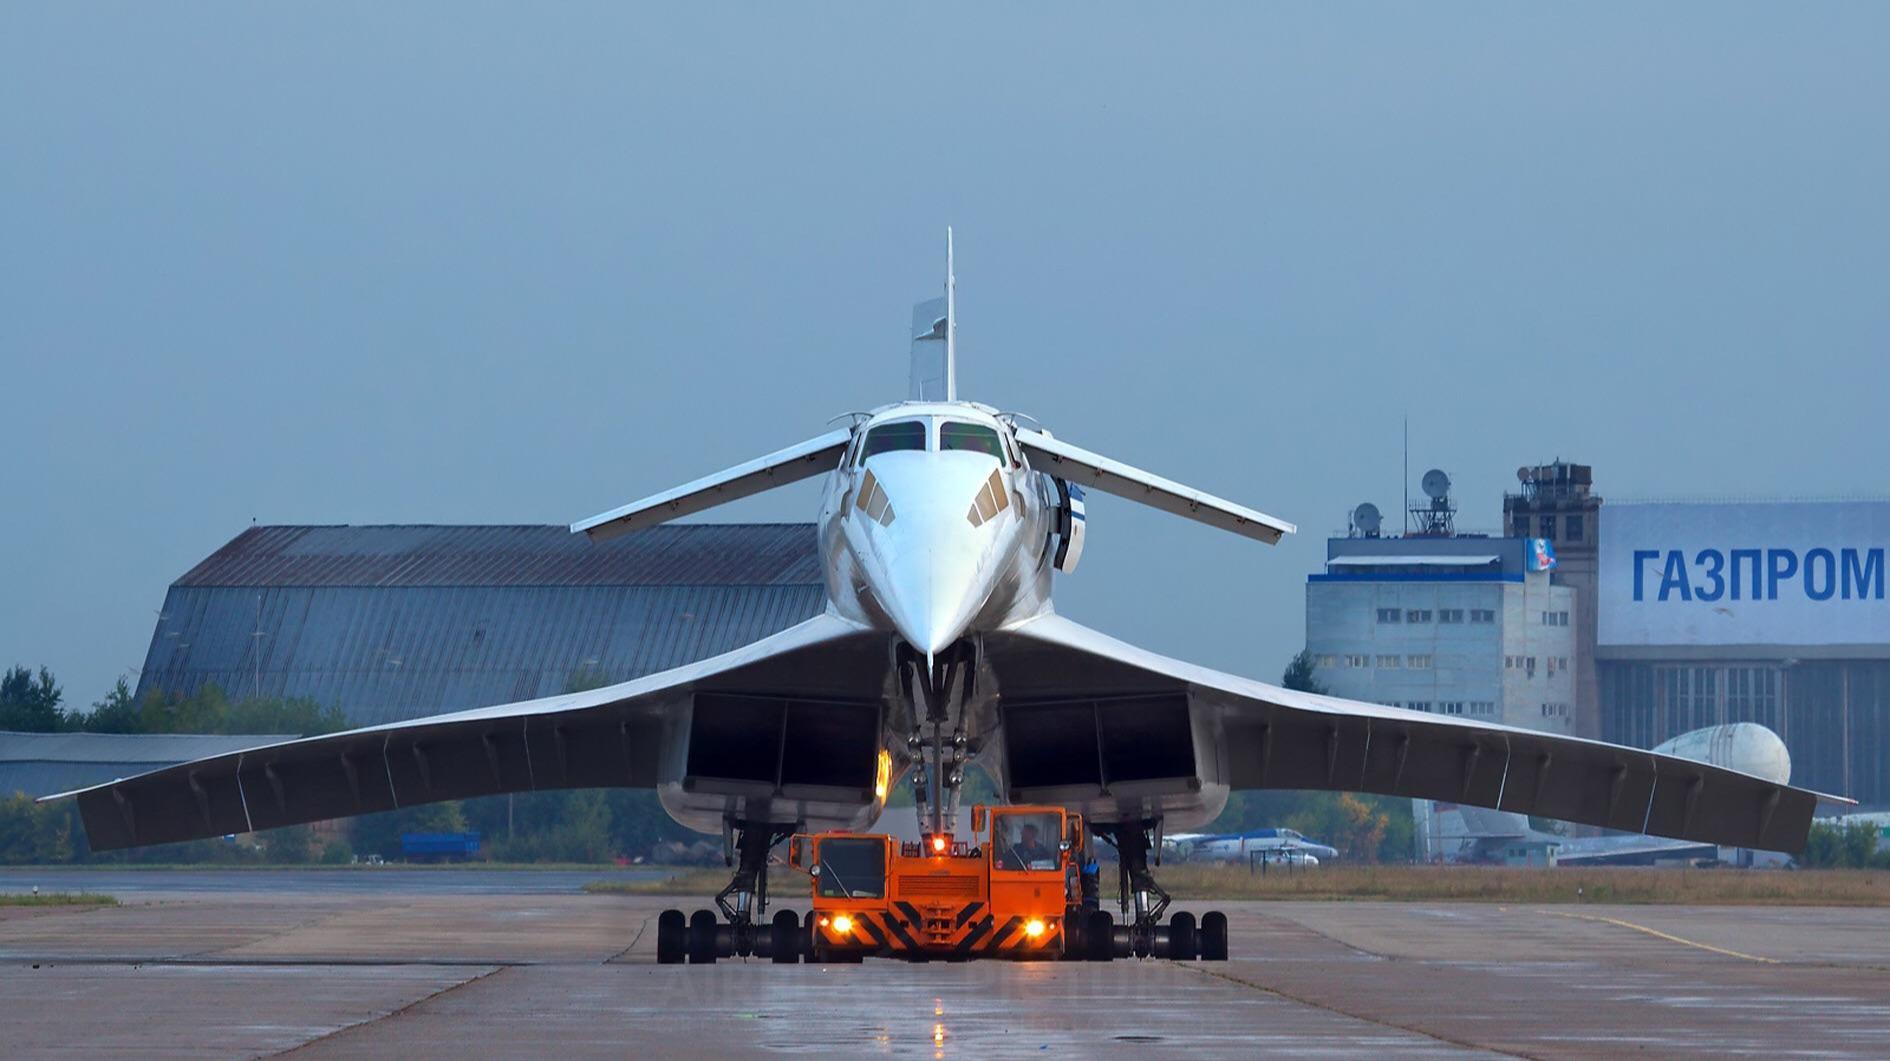 Soviet Communist Tupolev Tu-144 supersonic passenger aircraft and airliner.